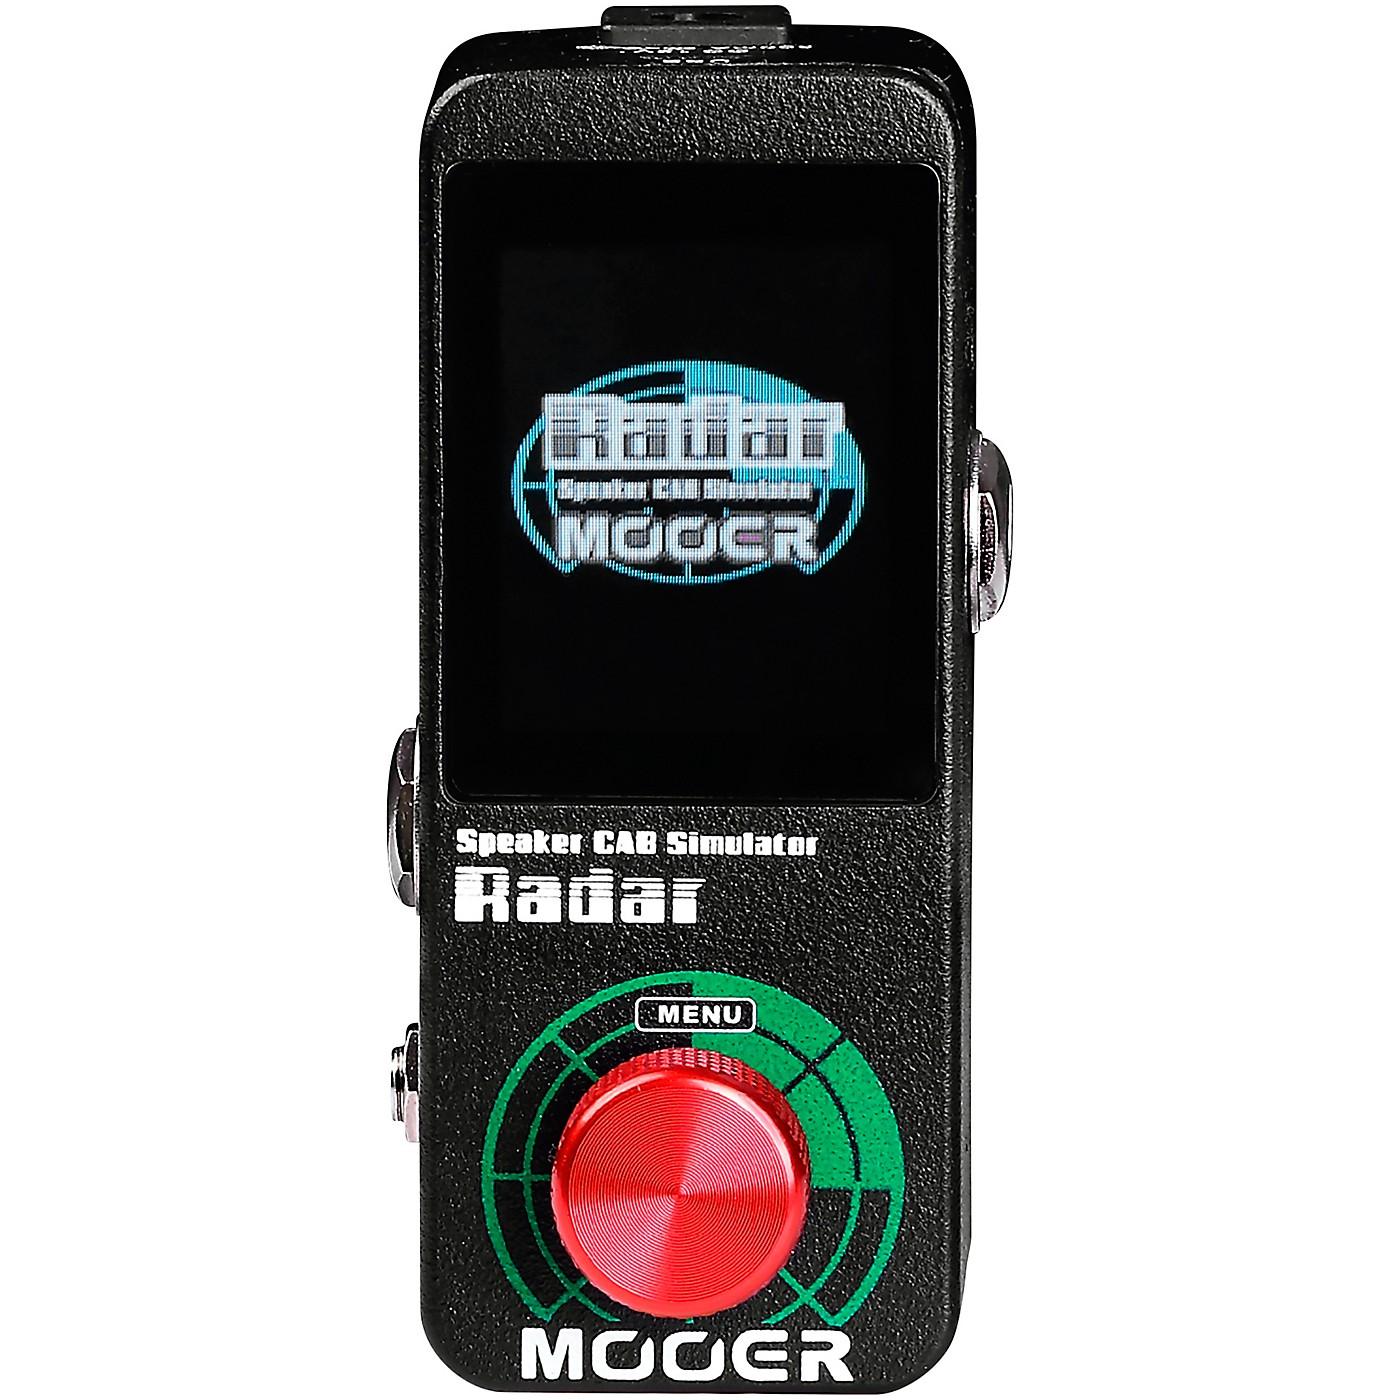 Mooer Radar Speaker Cab Simulator thumbnail